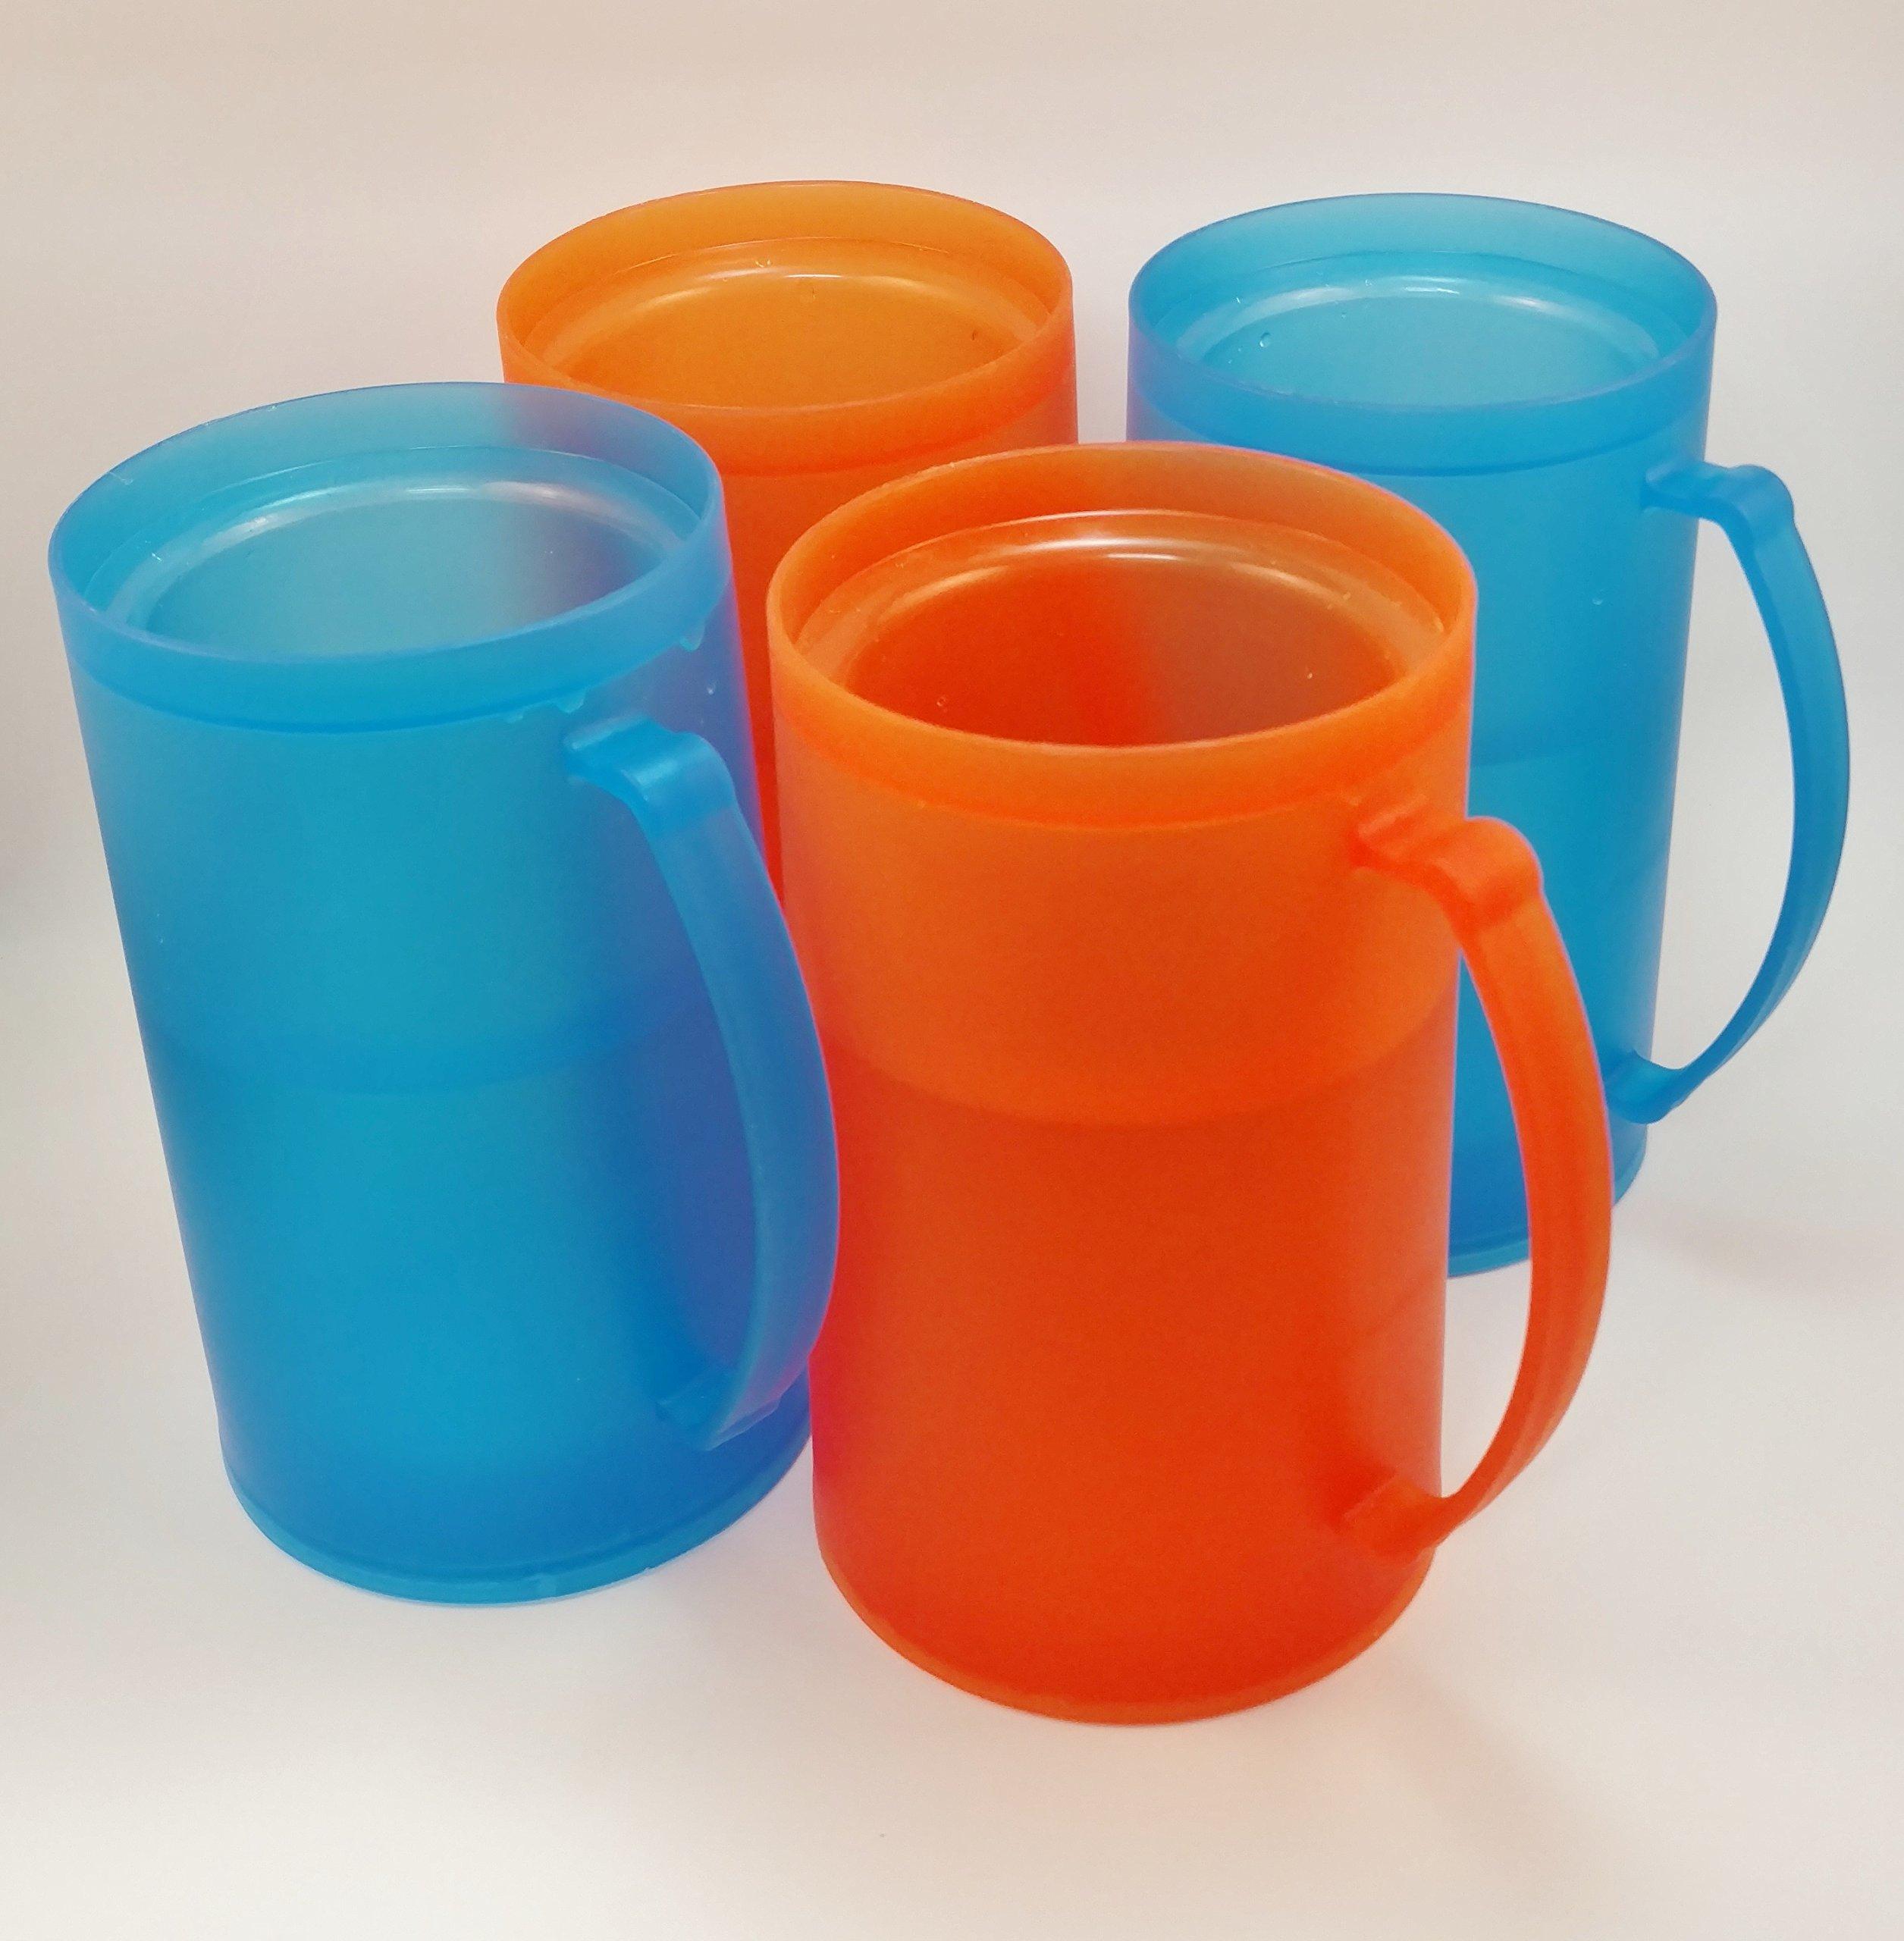 Vibrant Blue and Orange Frozen (Freezer) Beverage Mugs - Set of 4